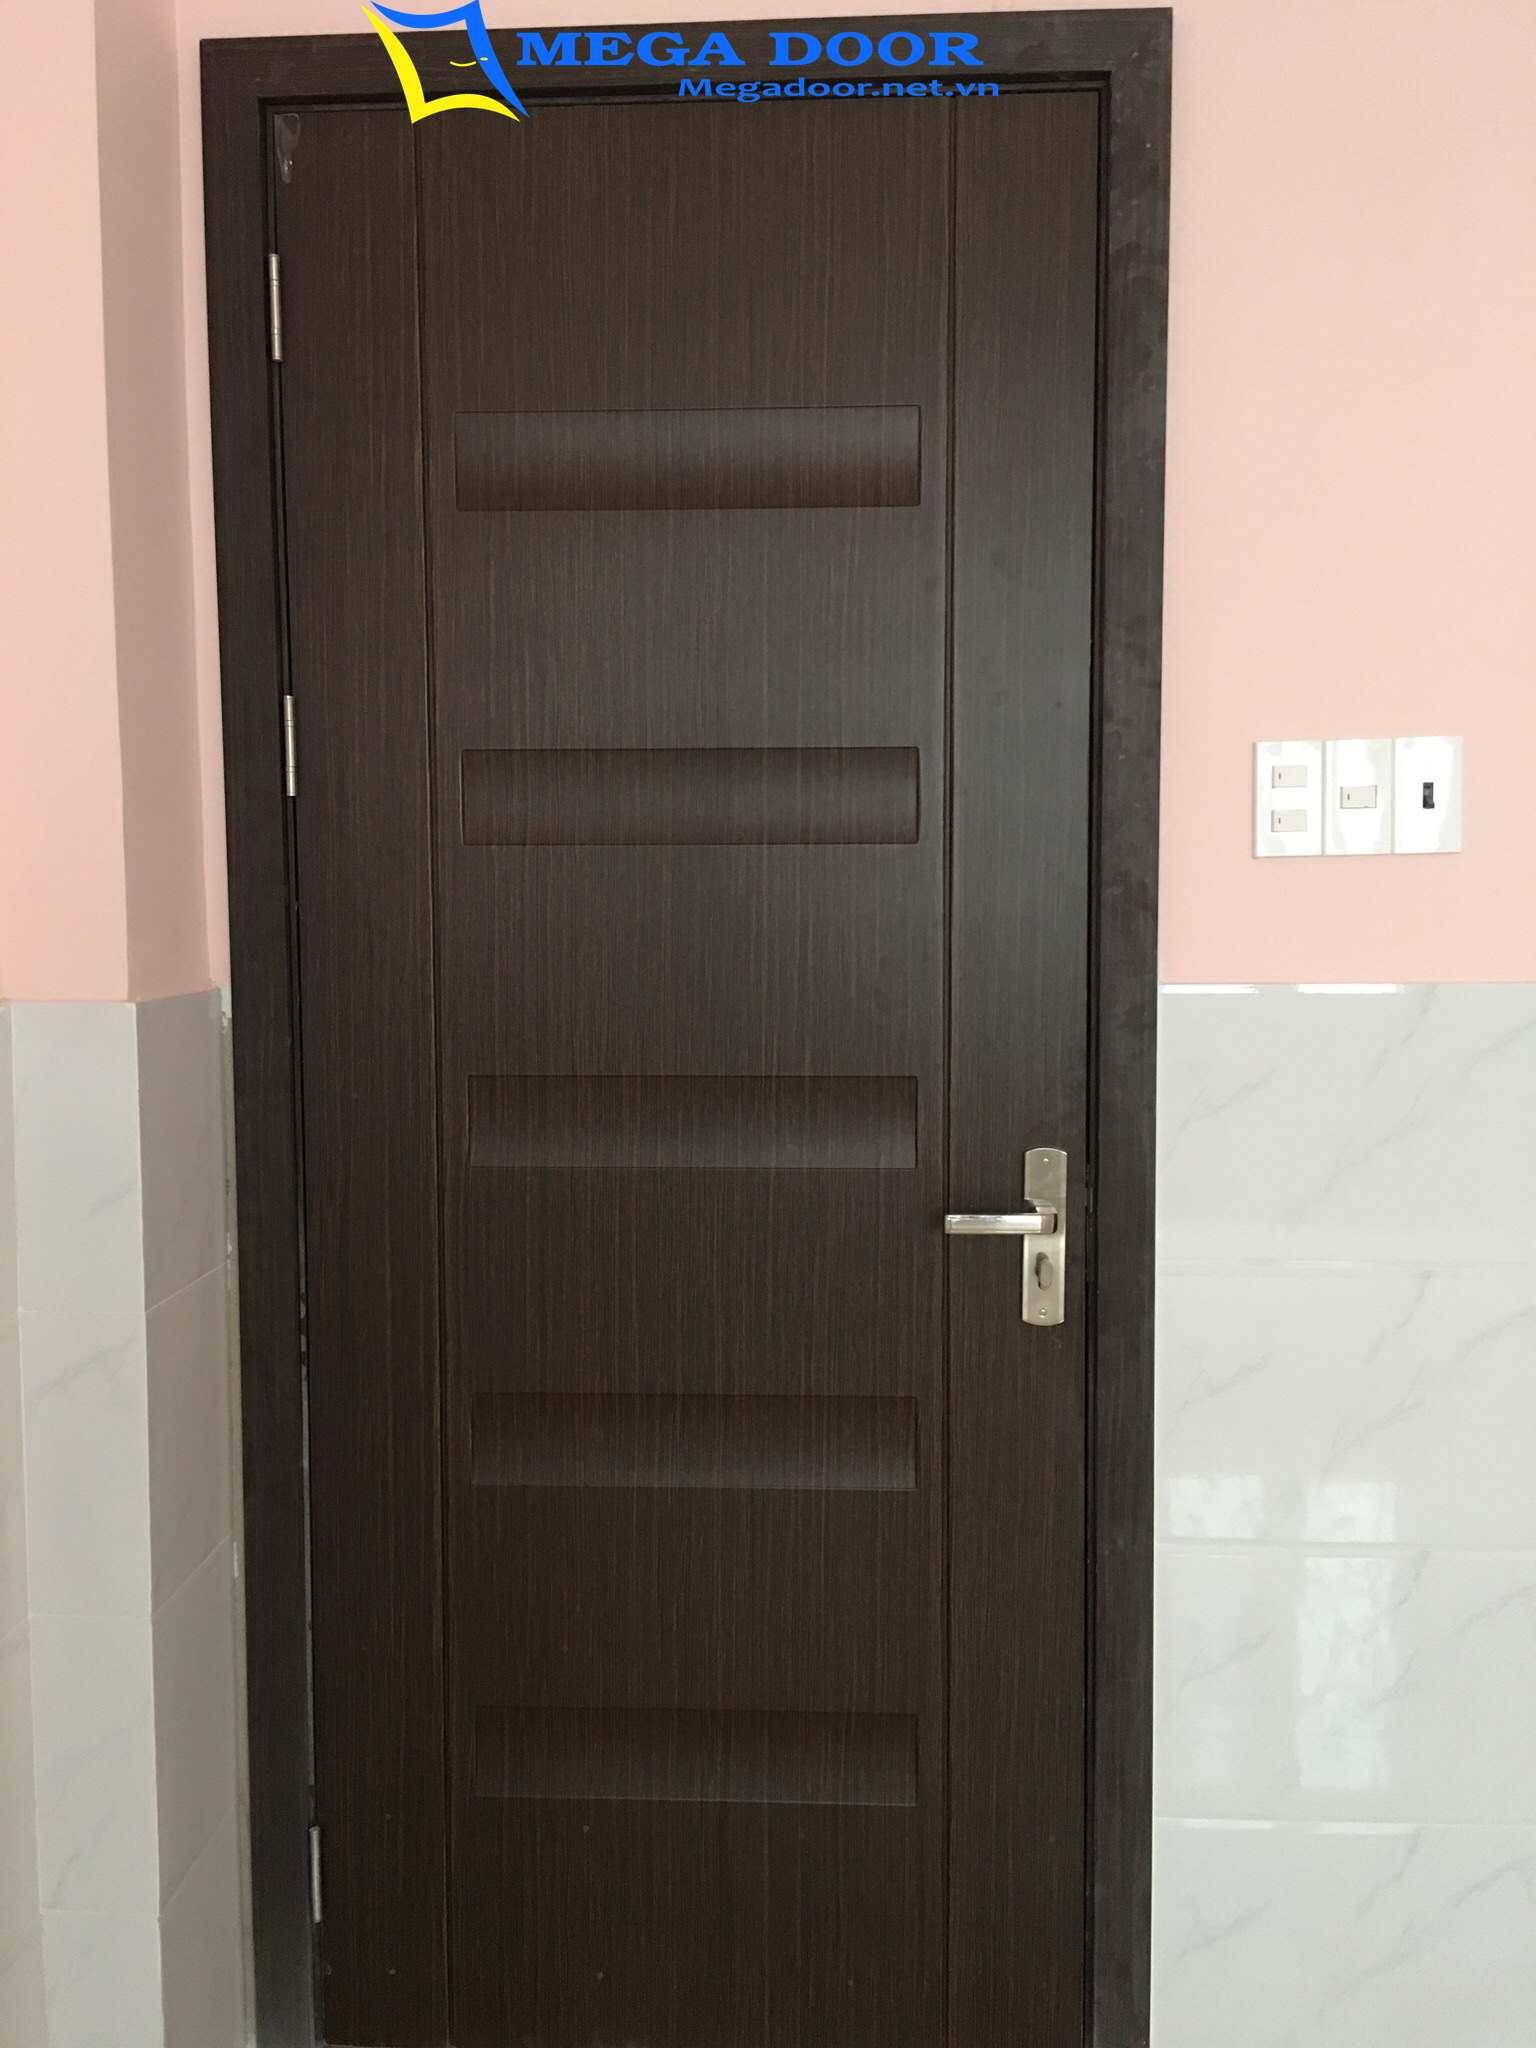 Cửa ABS megadoor Đỗ Xuân Hợp